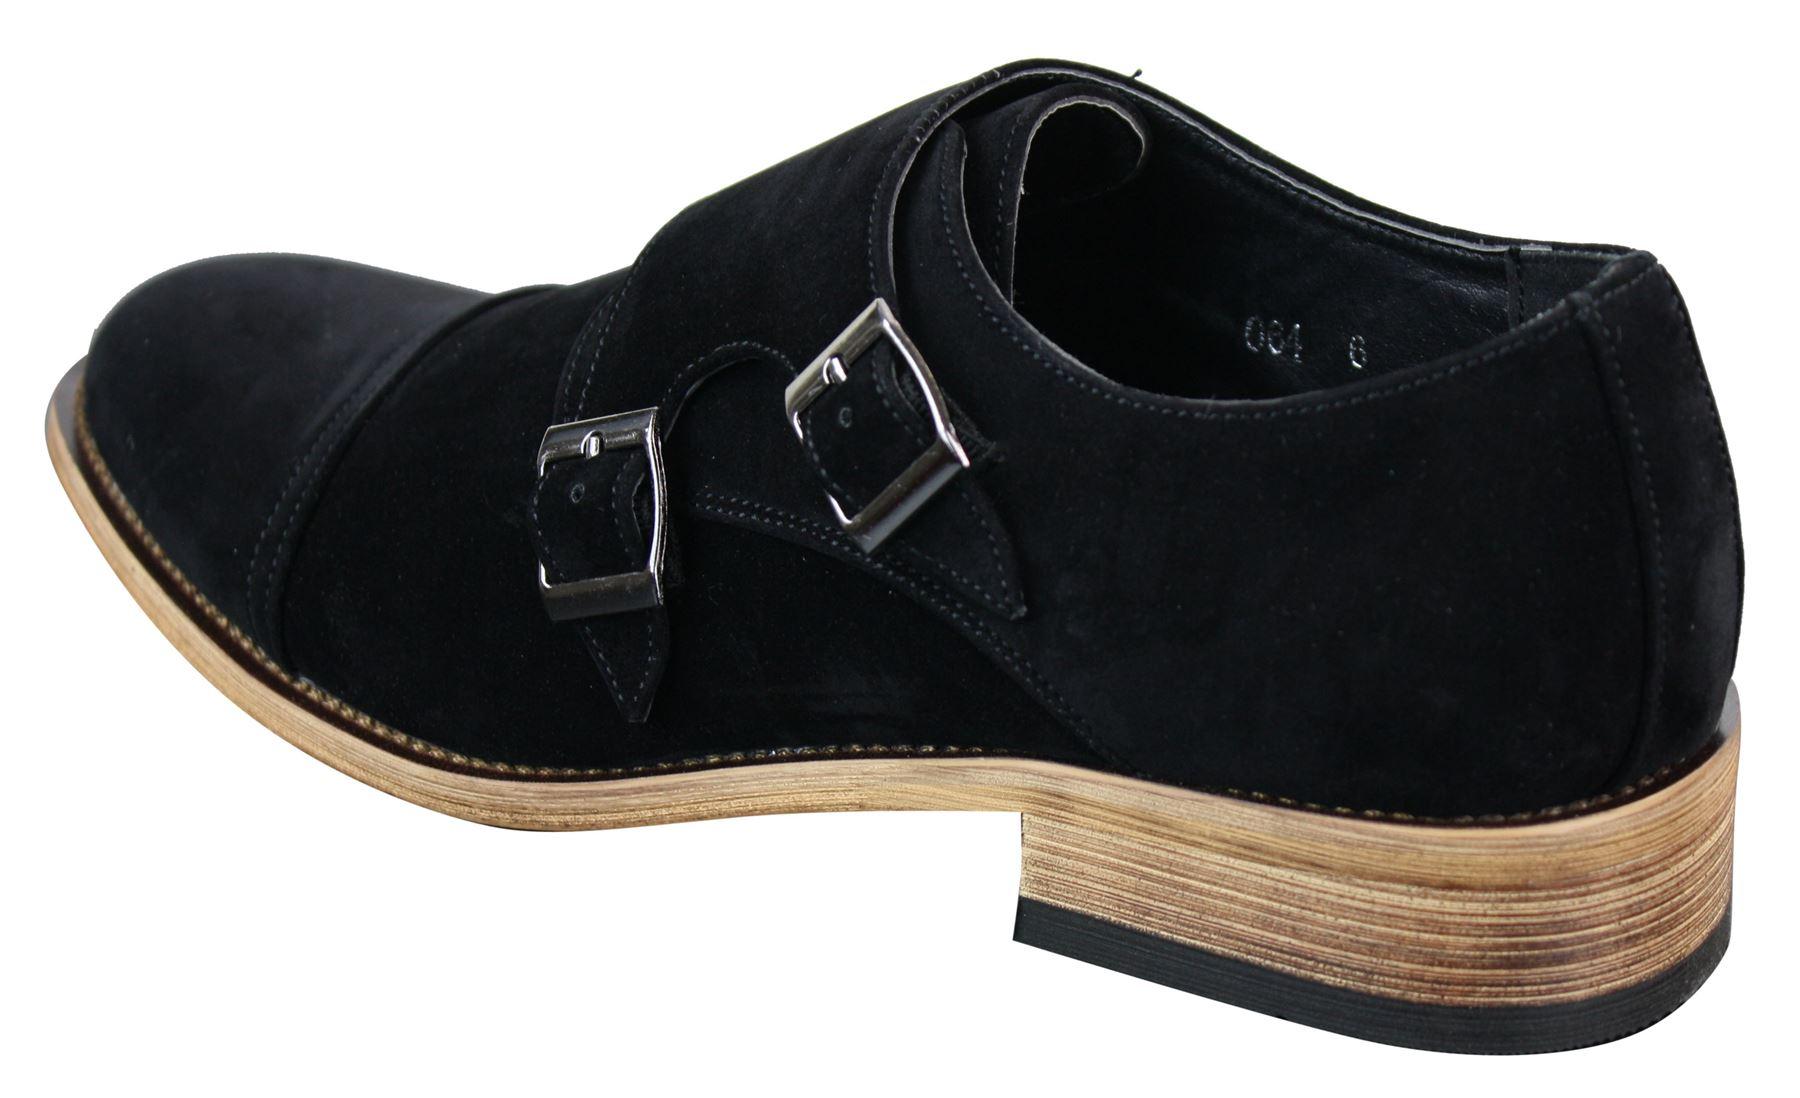 chaussures homme simili daim rabat double boucle style. Black Bedroom Furniture Sets. Home Design Ideas